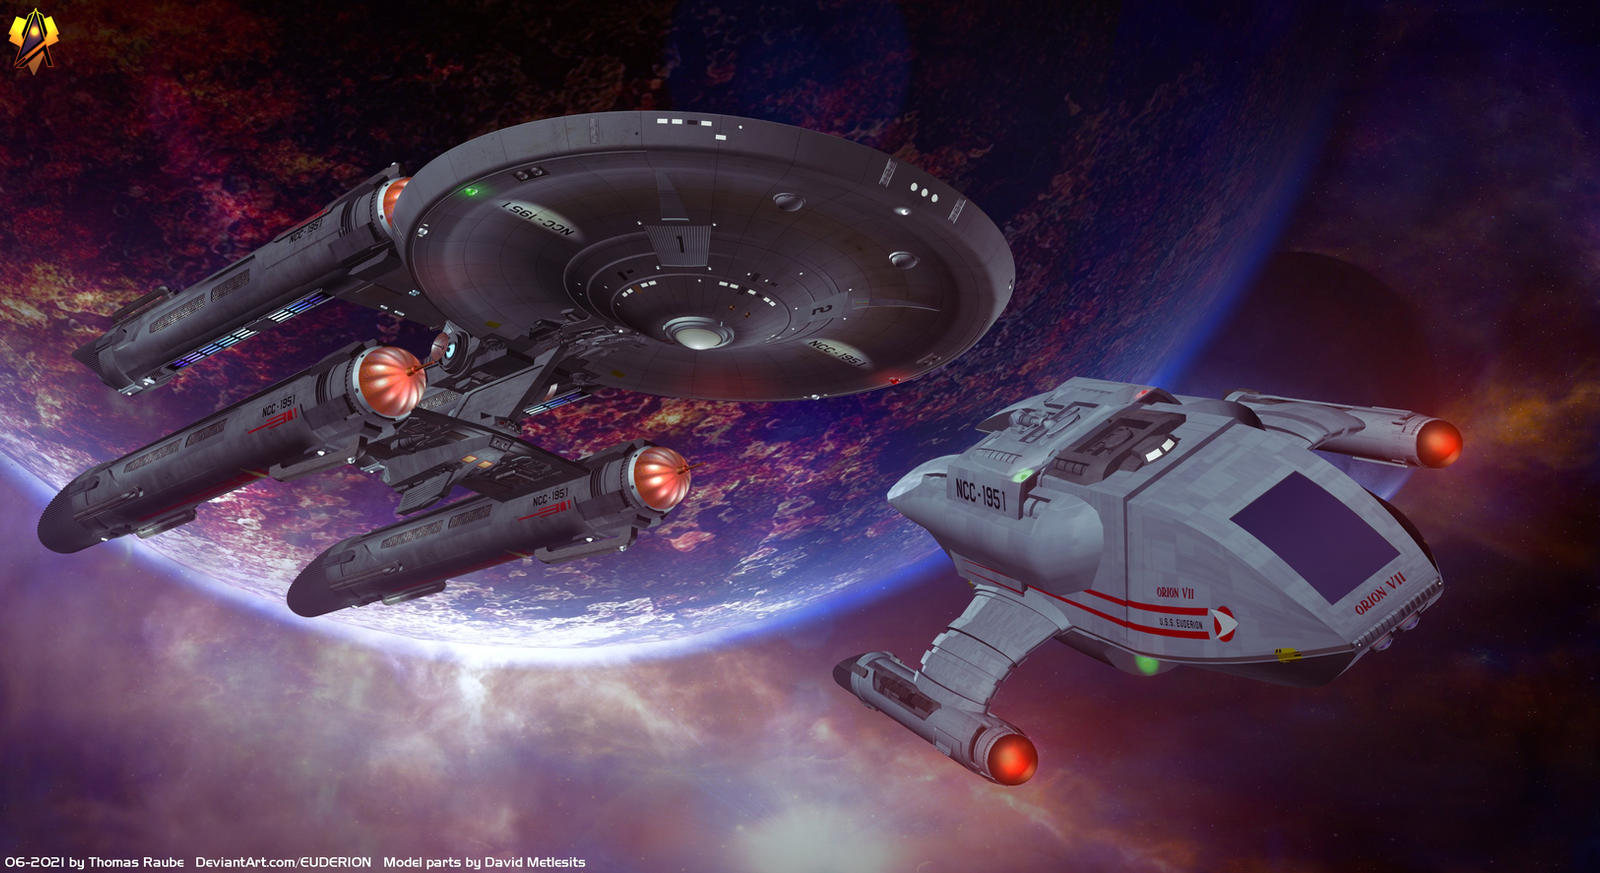 Shuttlecraft Orion